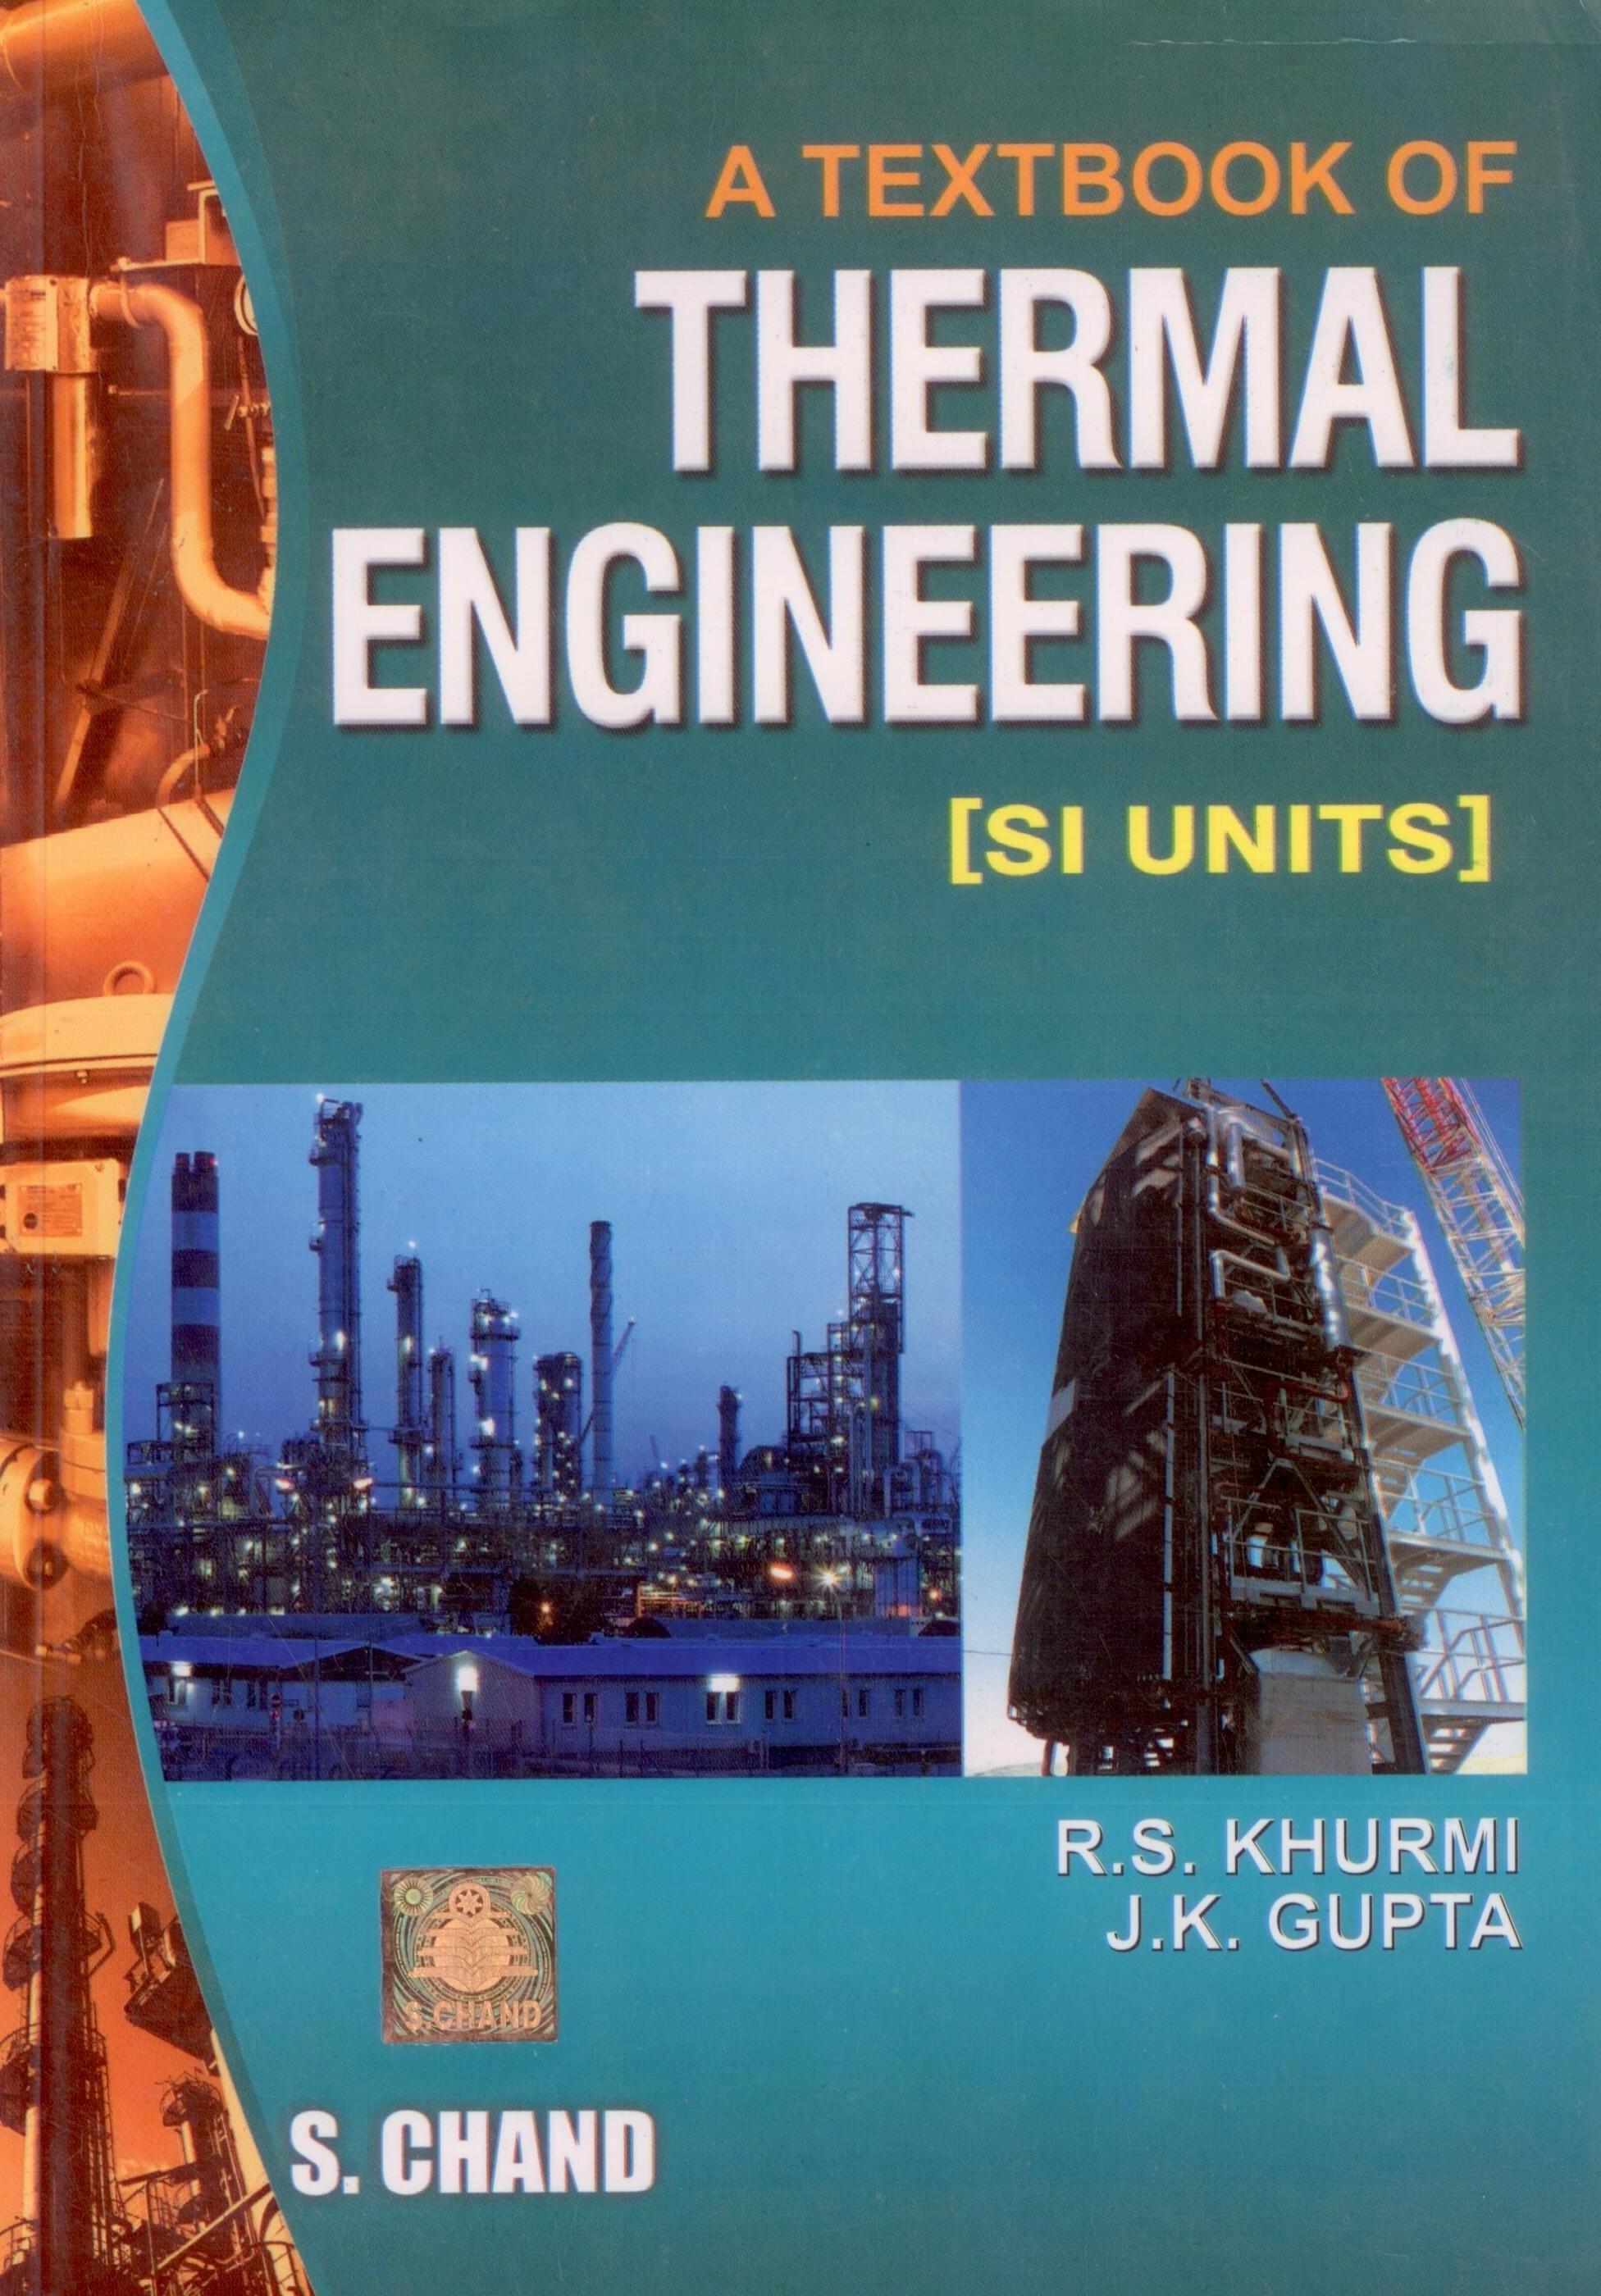 Theory Of Machines by R. S. Khurmi J.K. Gupta PDF Free Download